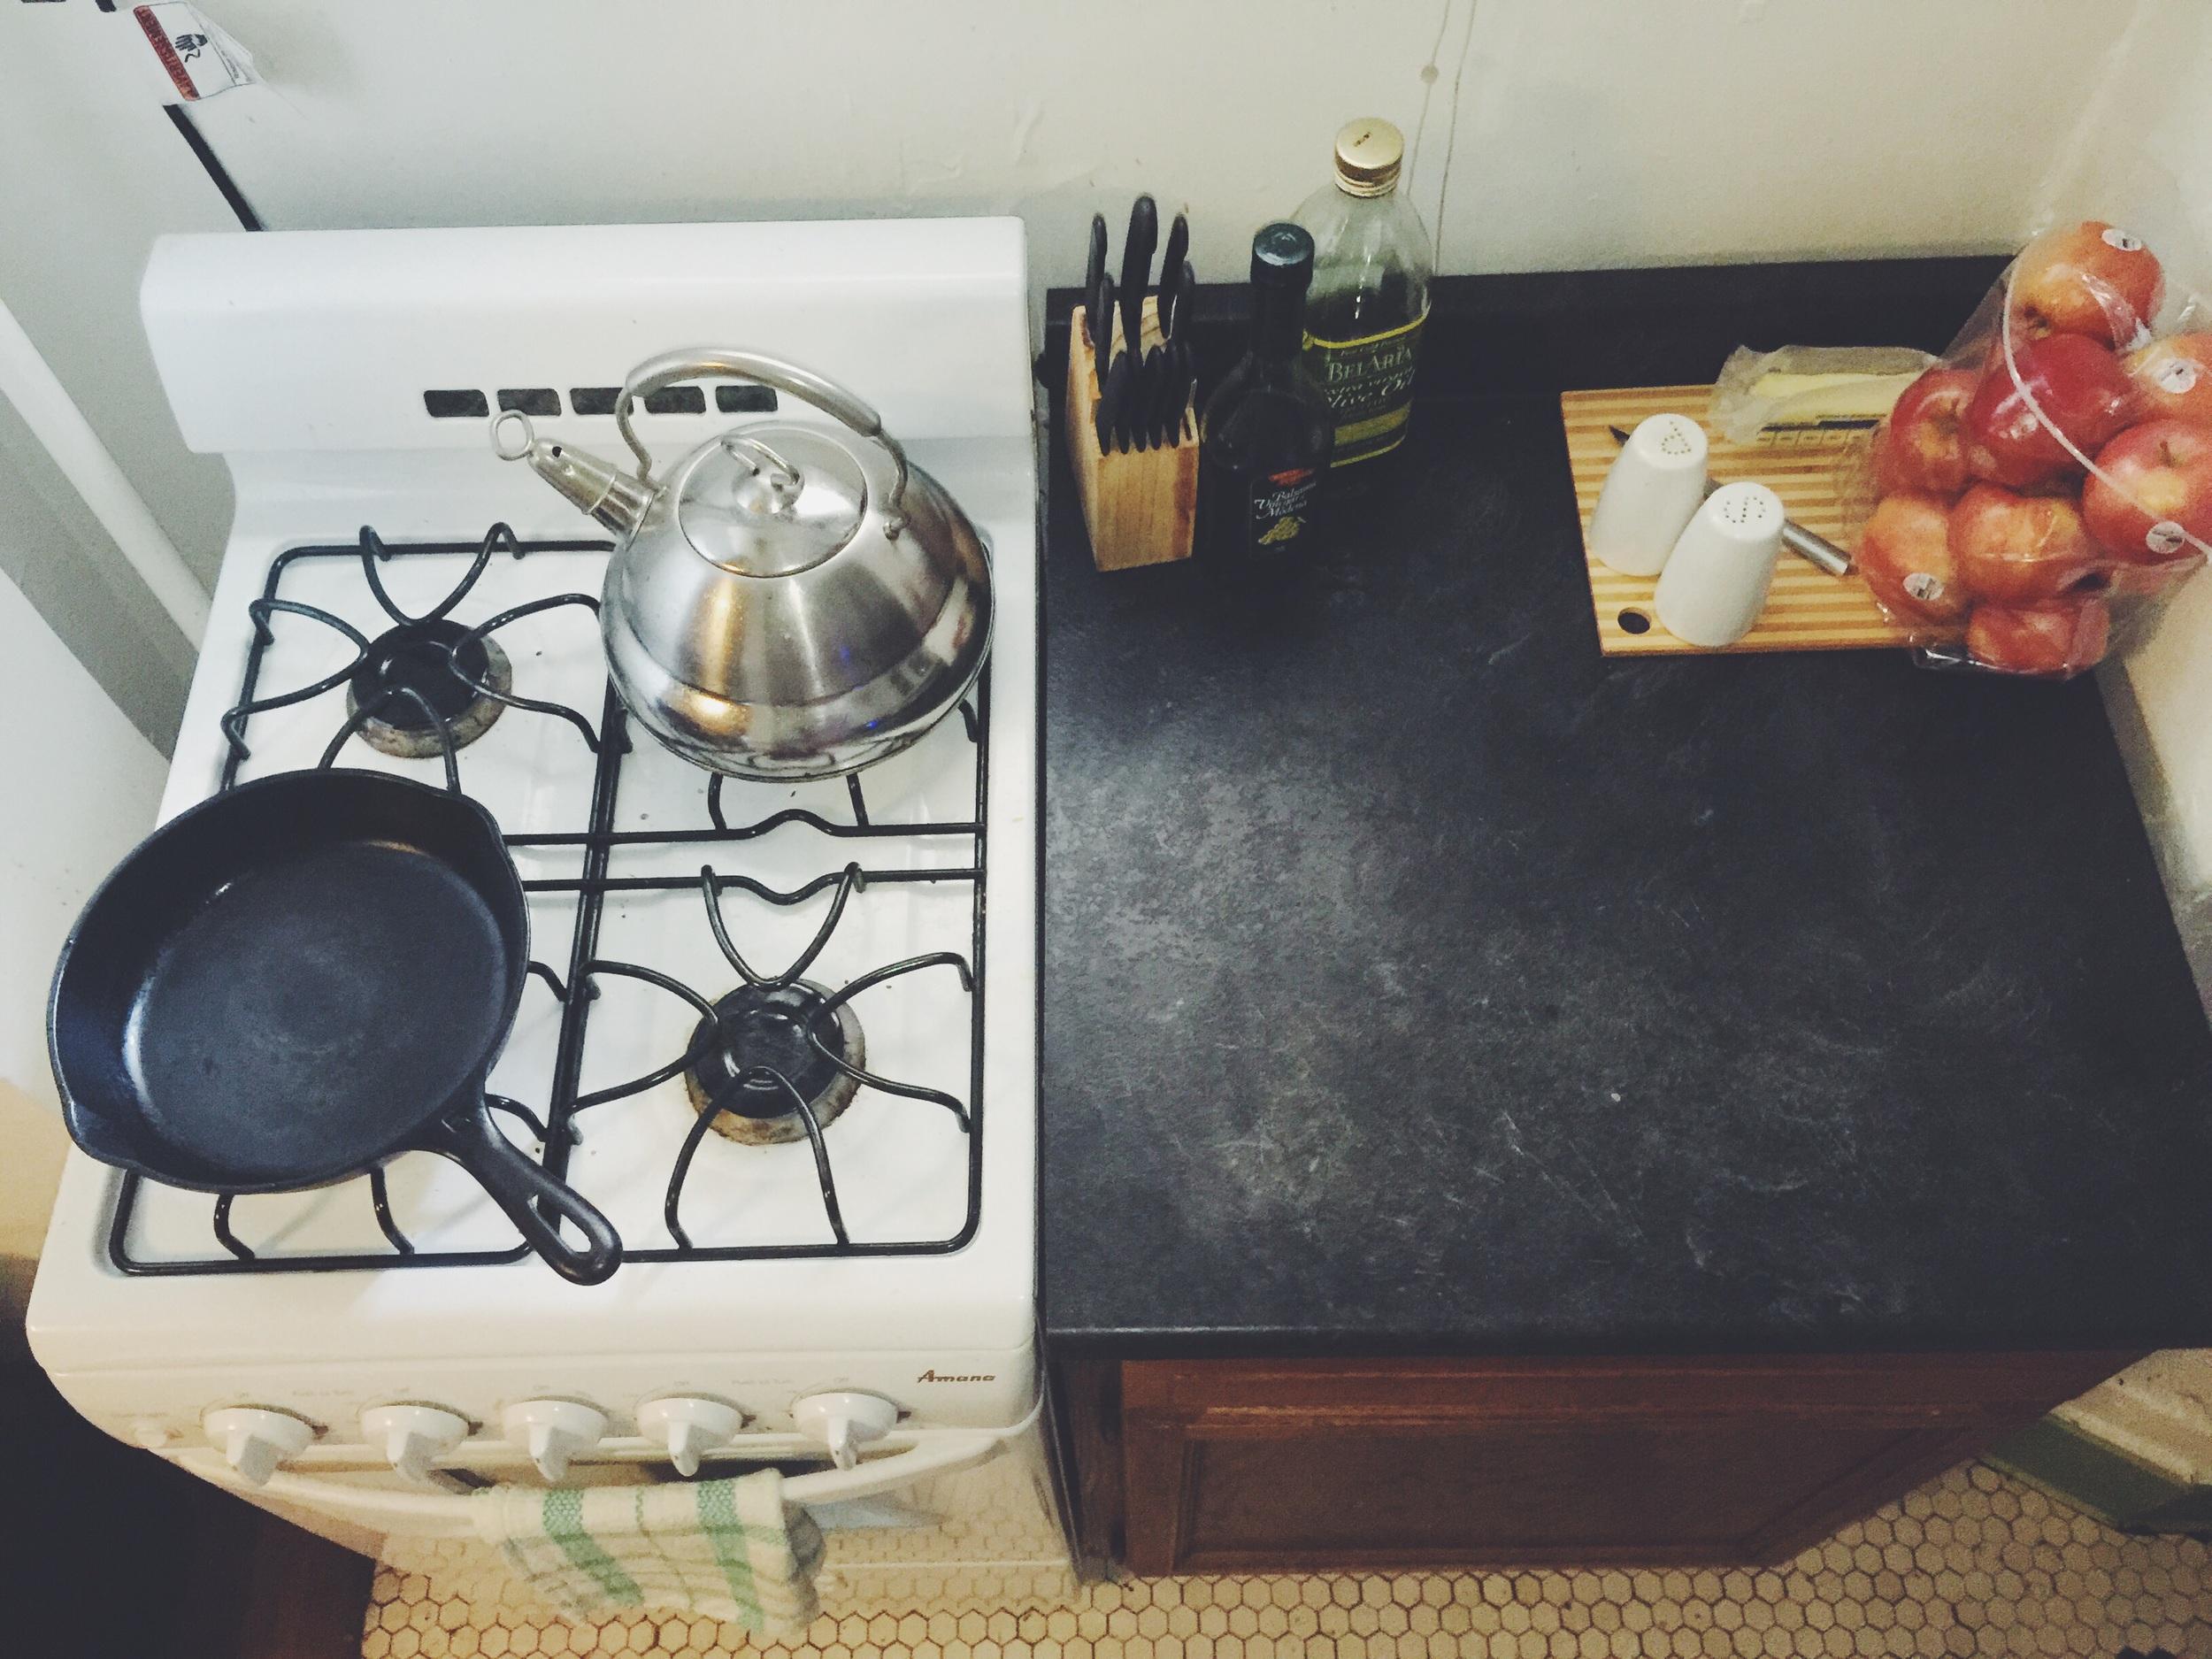 stove + countertop